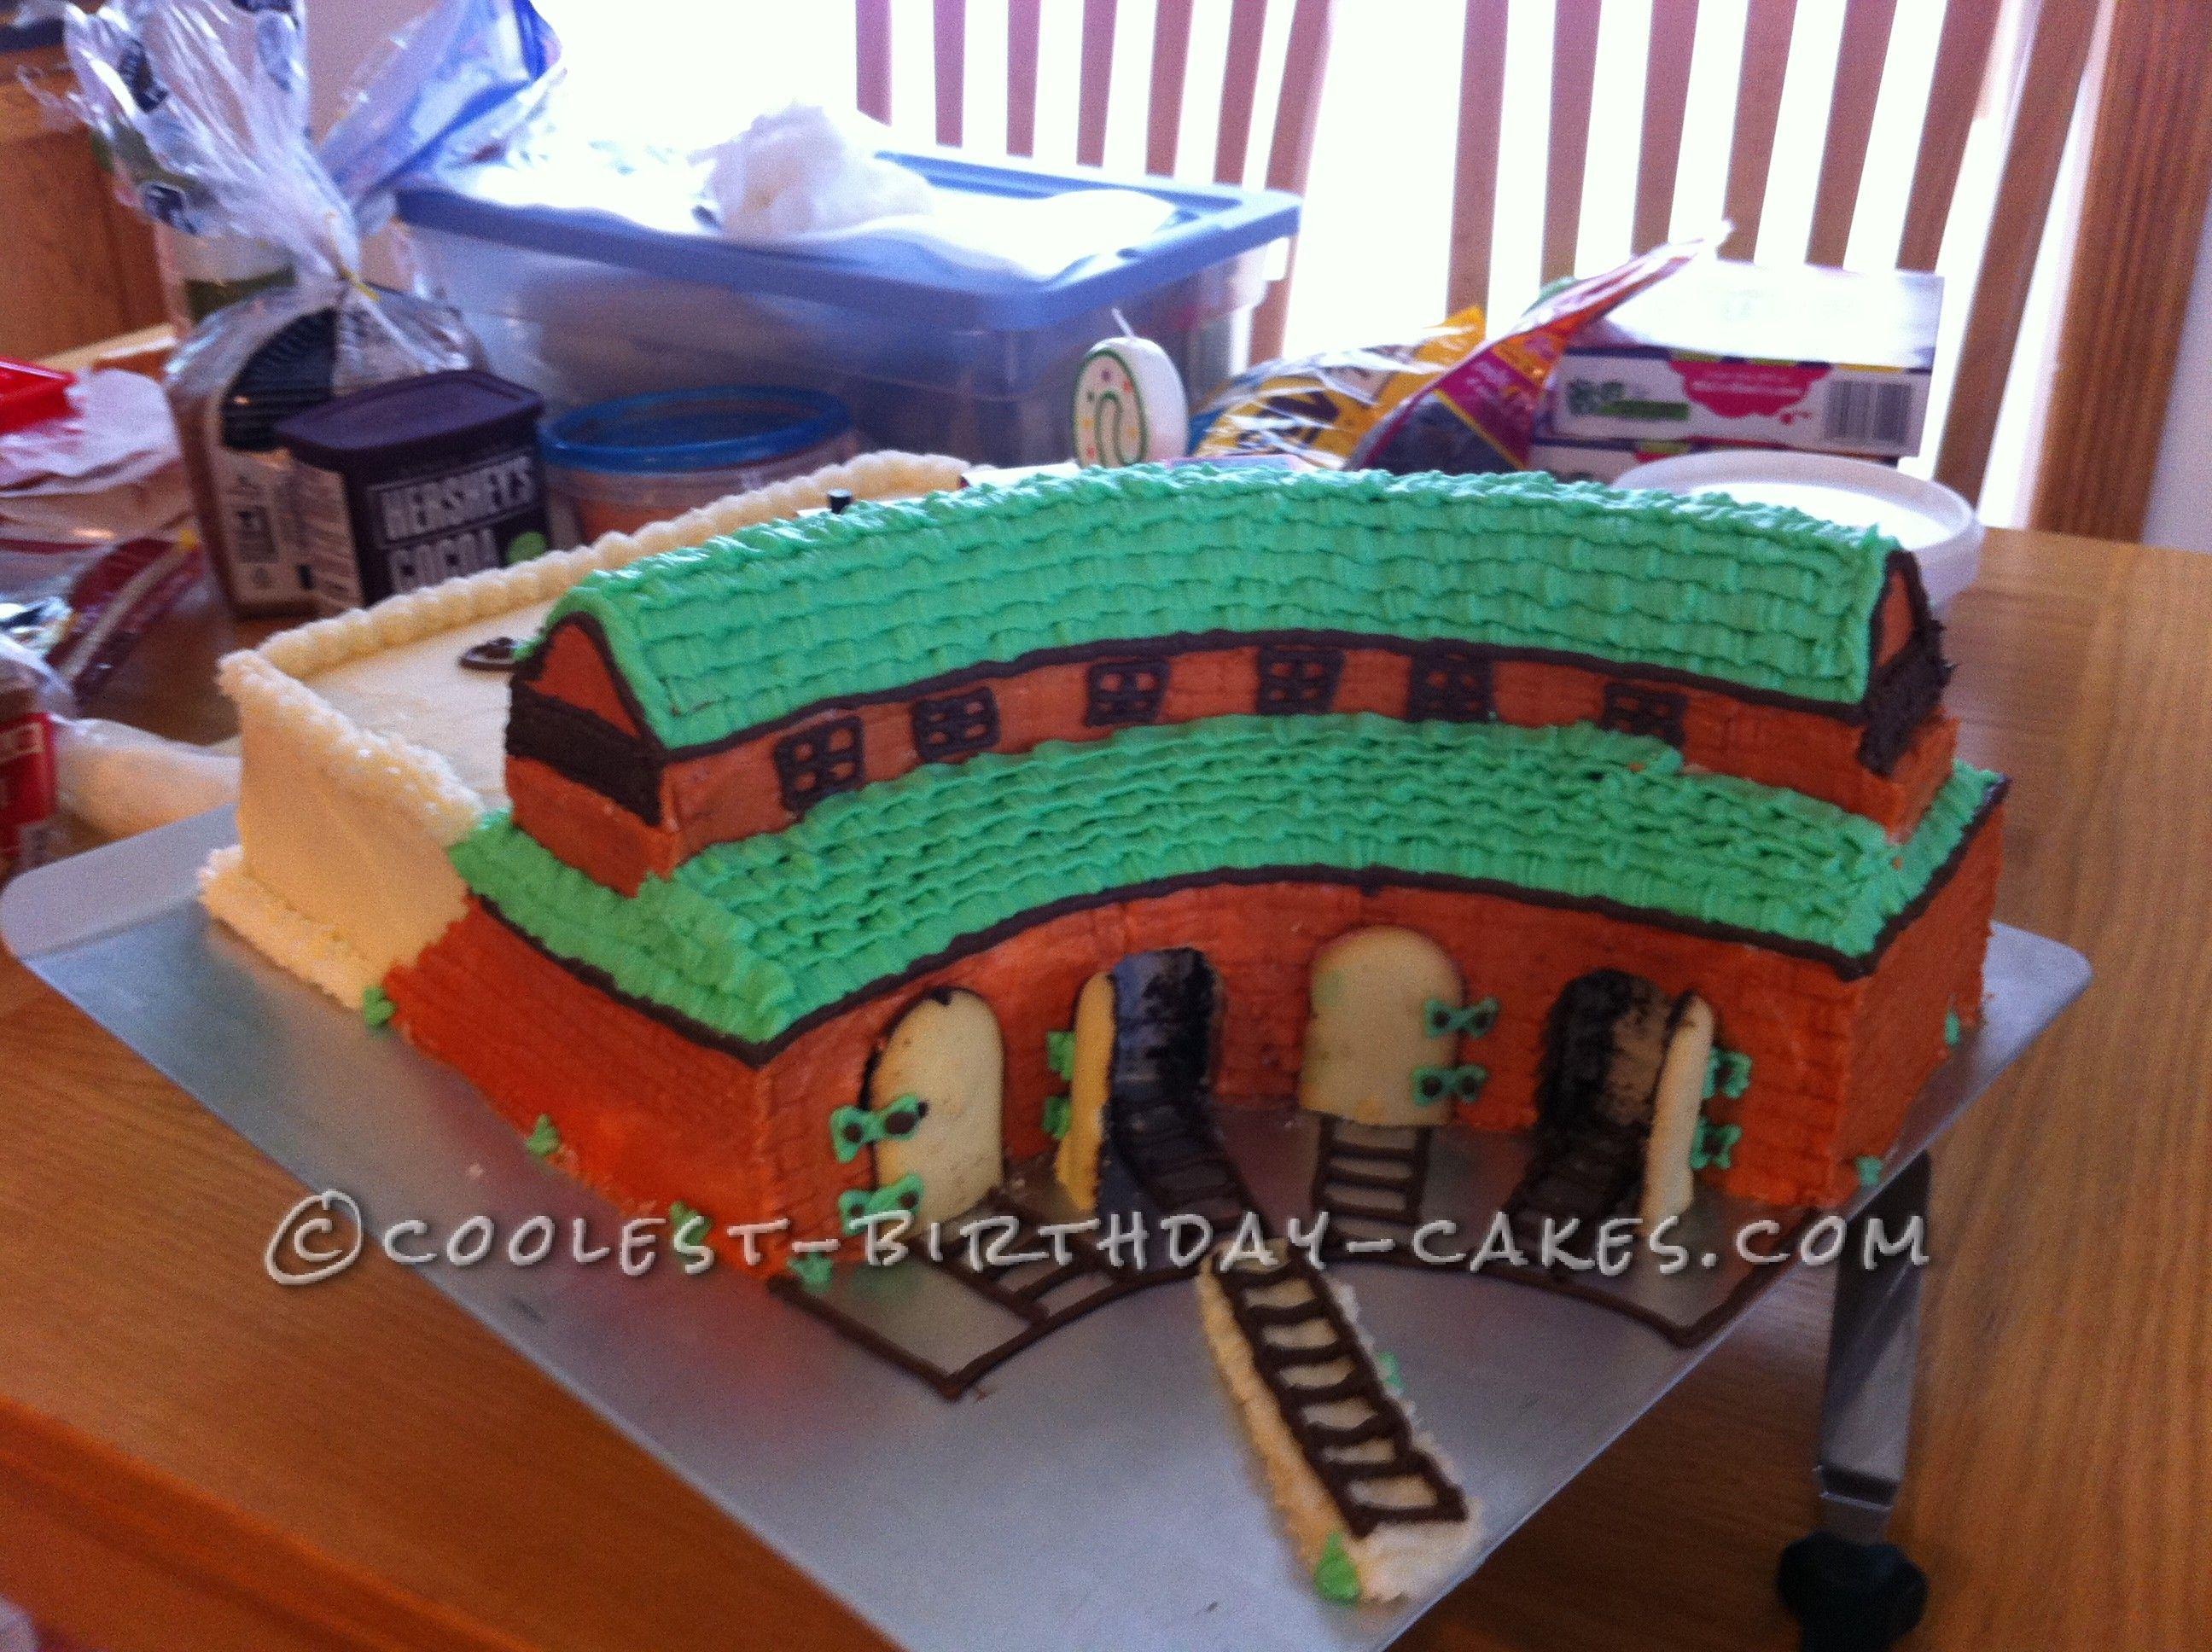 Sams Thomas The Train Roundhouse Cake Birthday Cakes Cake And